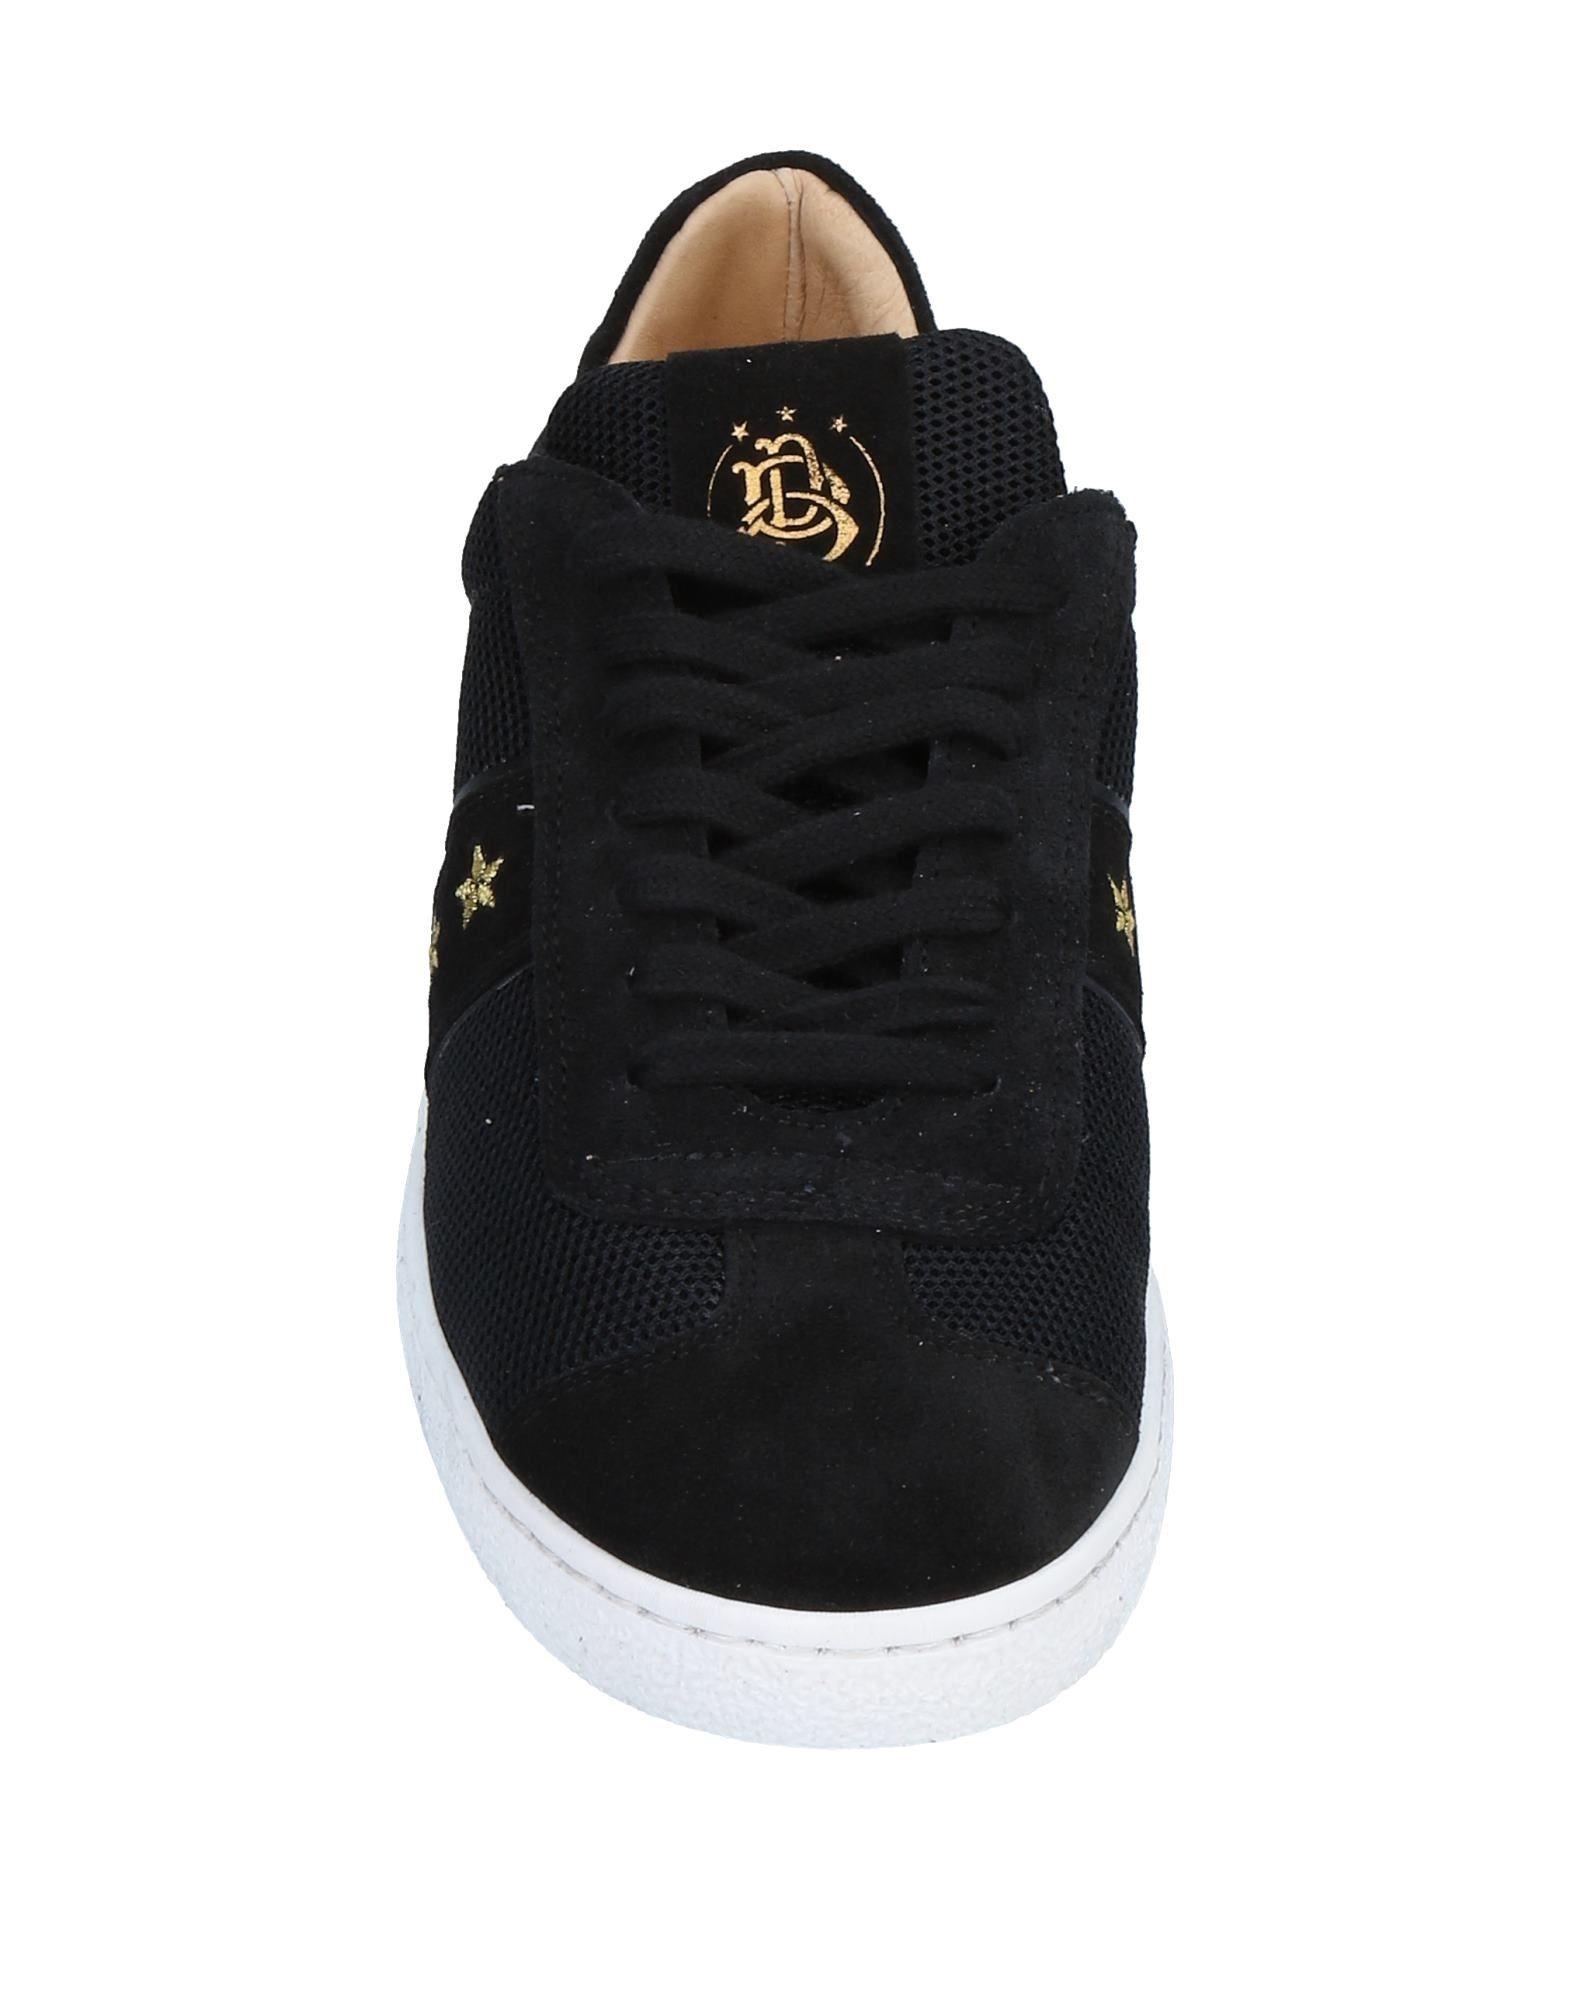 Rabatt Pantofola echte Schuhe Pantofola Rabatt D oro Turnschuhes Herren 11569821LF 7ed254